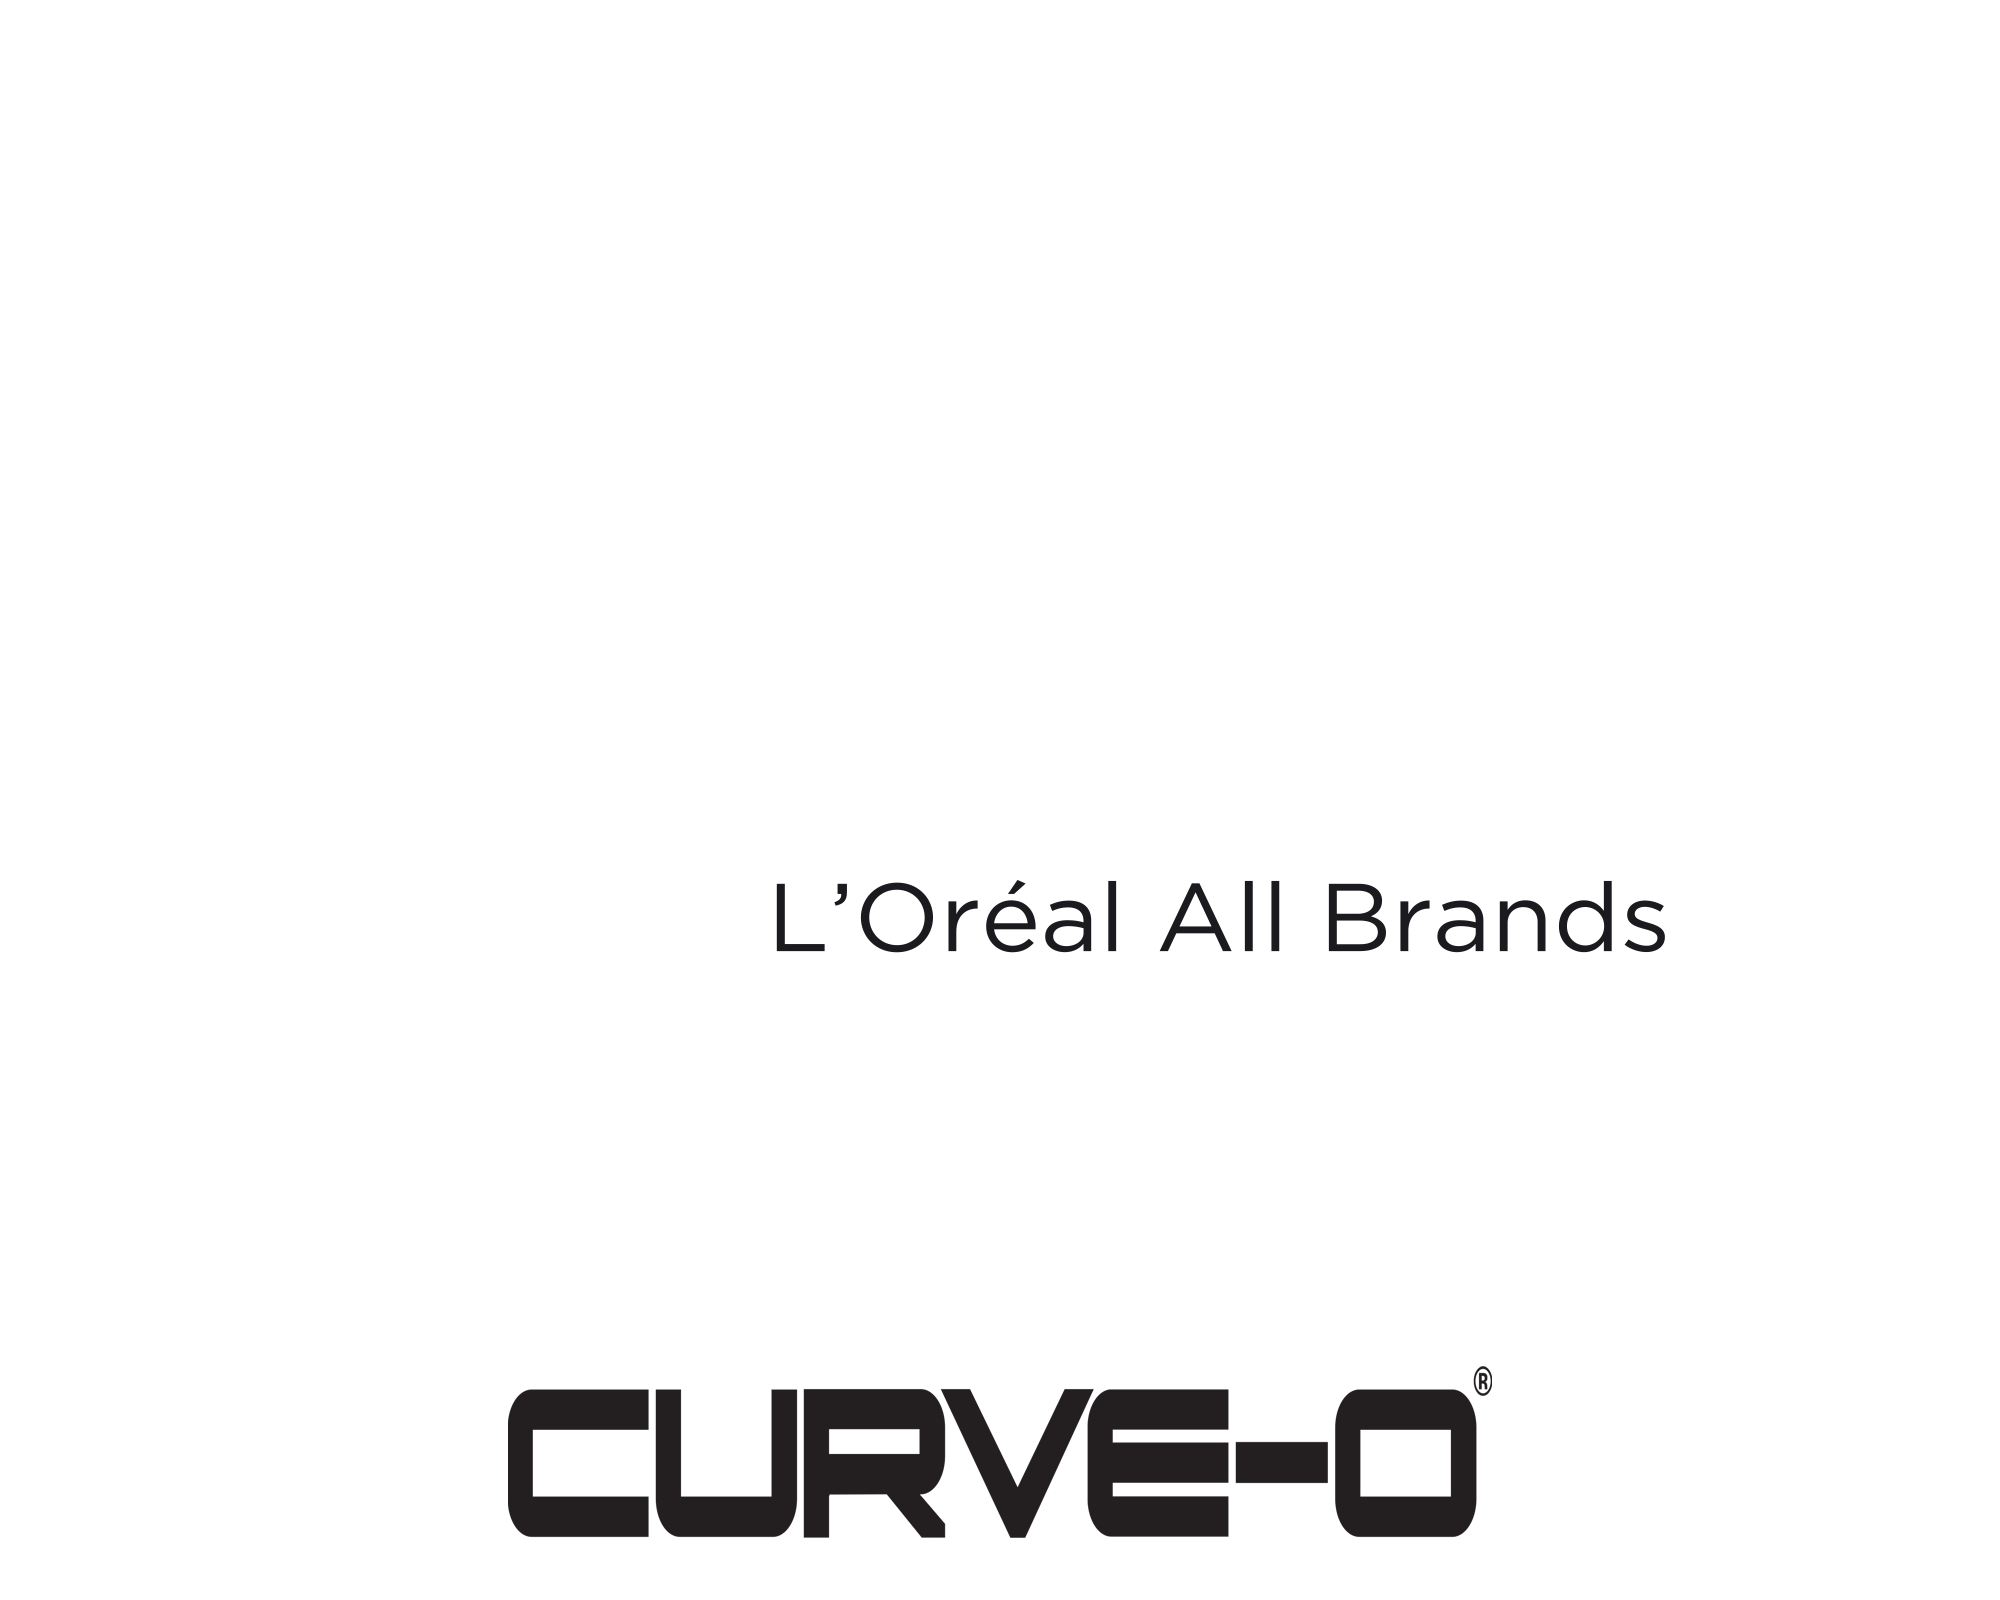 LAB - L'Oréal All Brands - Professional Beauty | CURVE-O